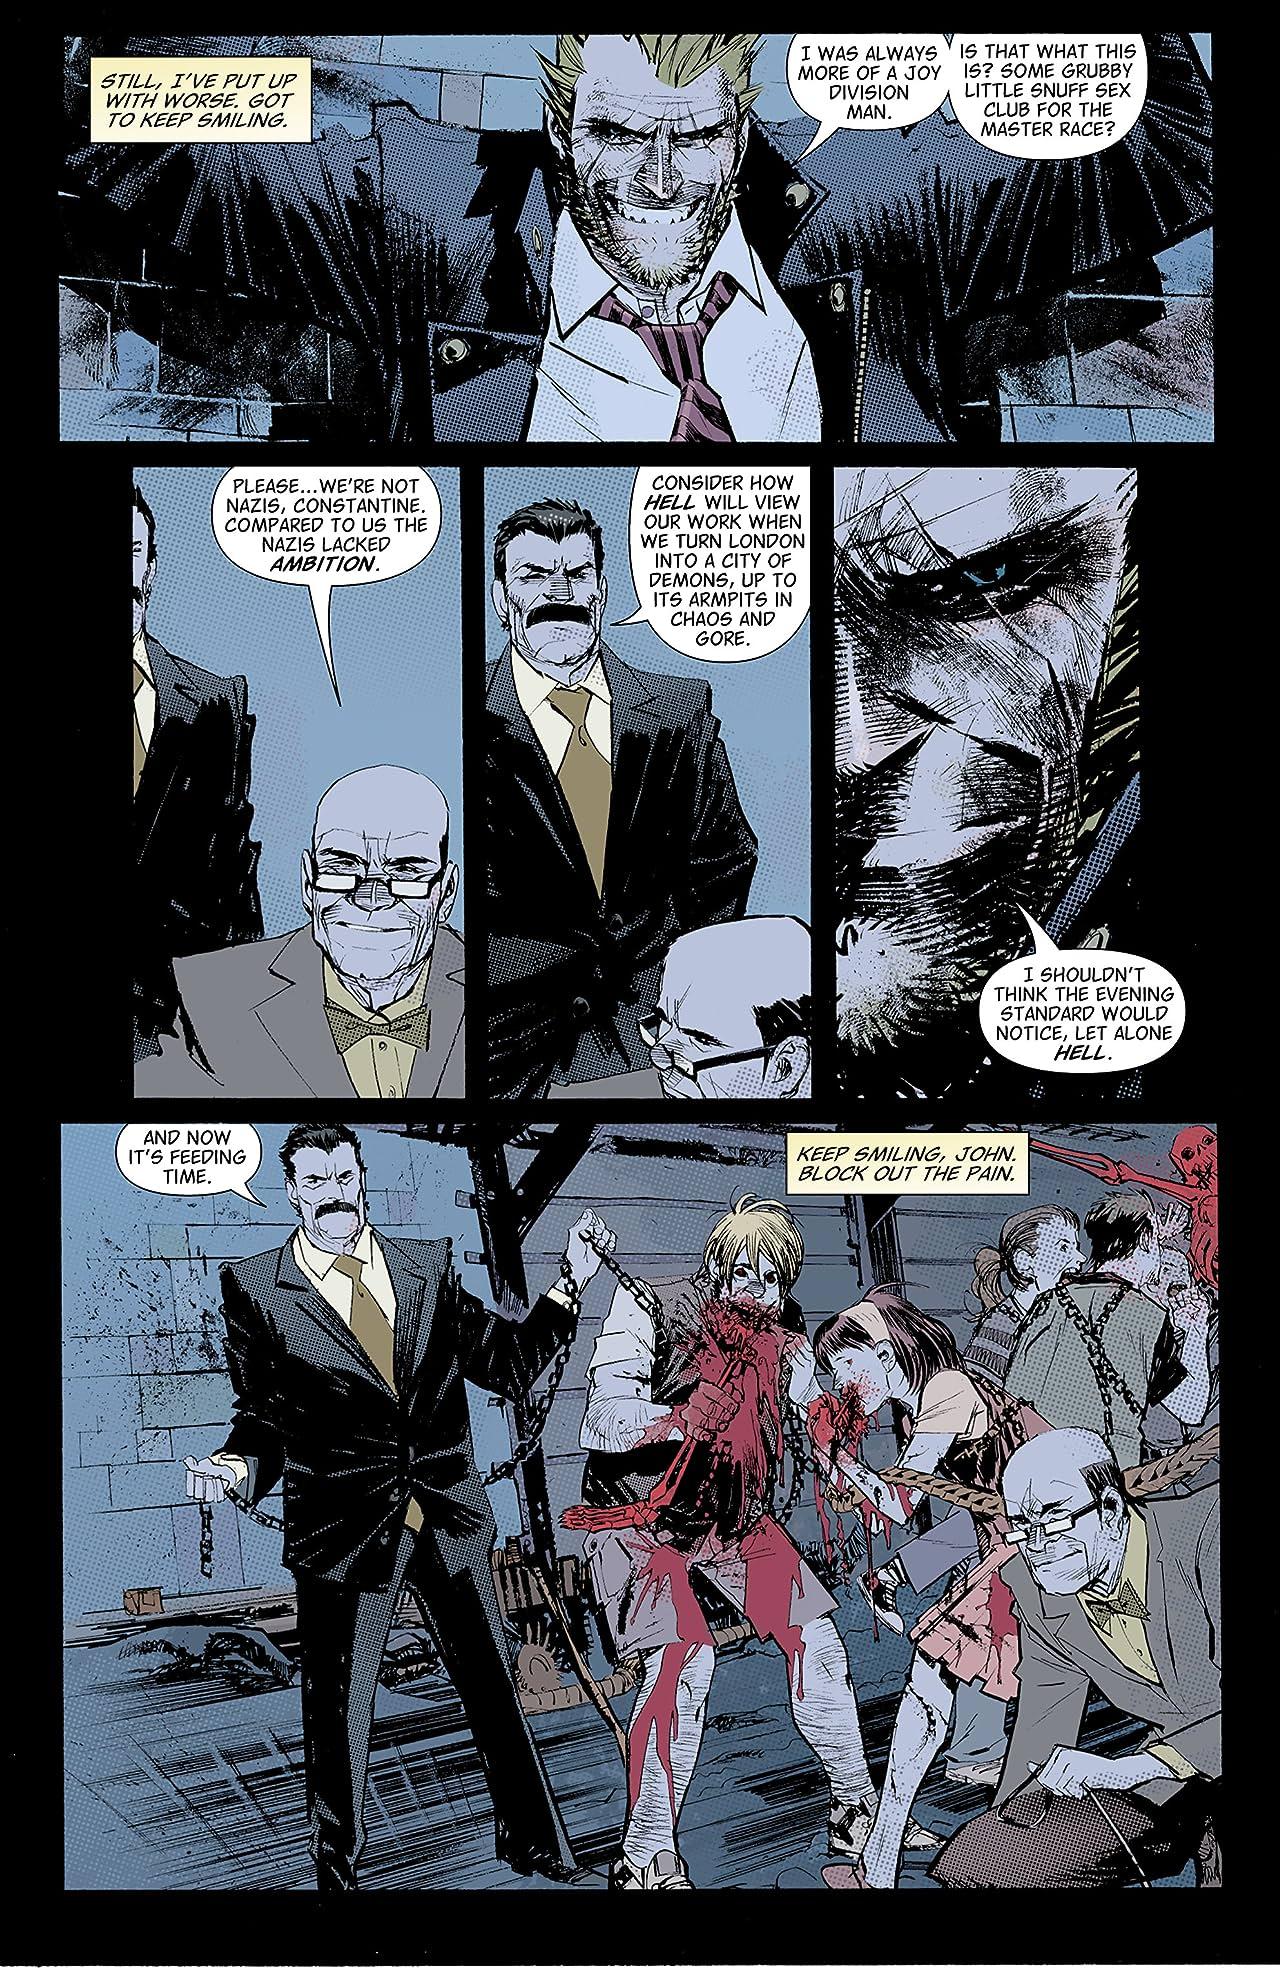 John Constantine: Hellblazer - City of Demons #5 (of 5)